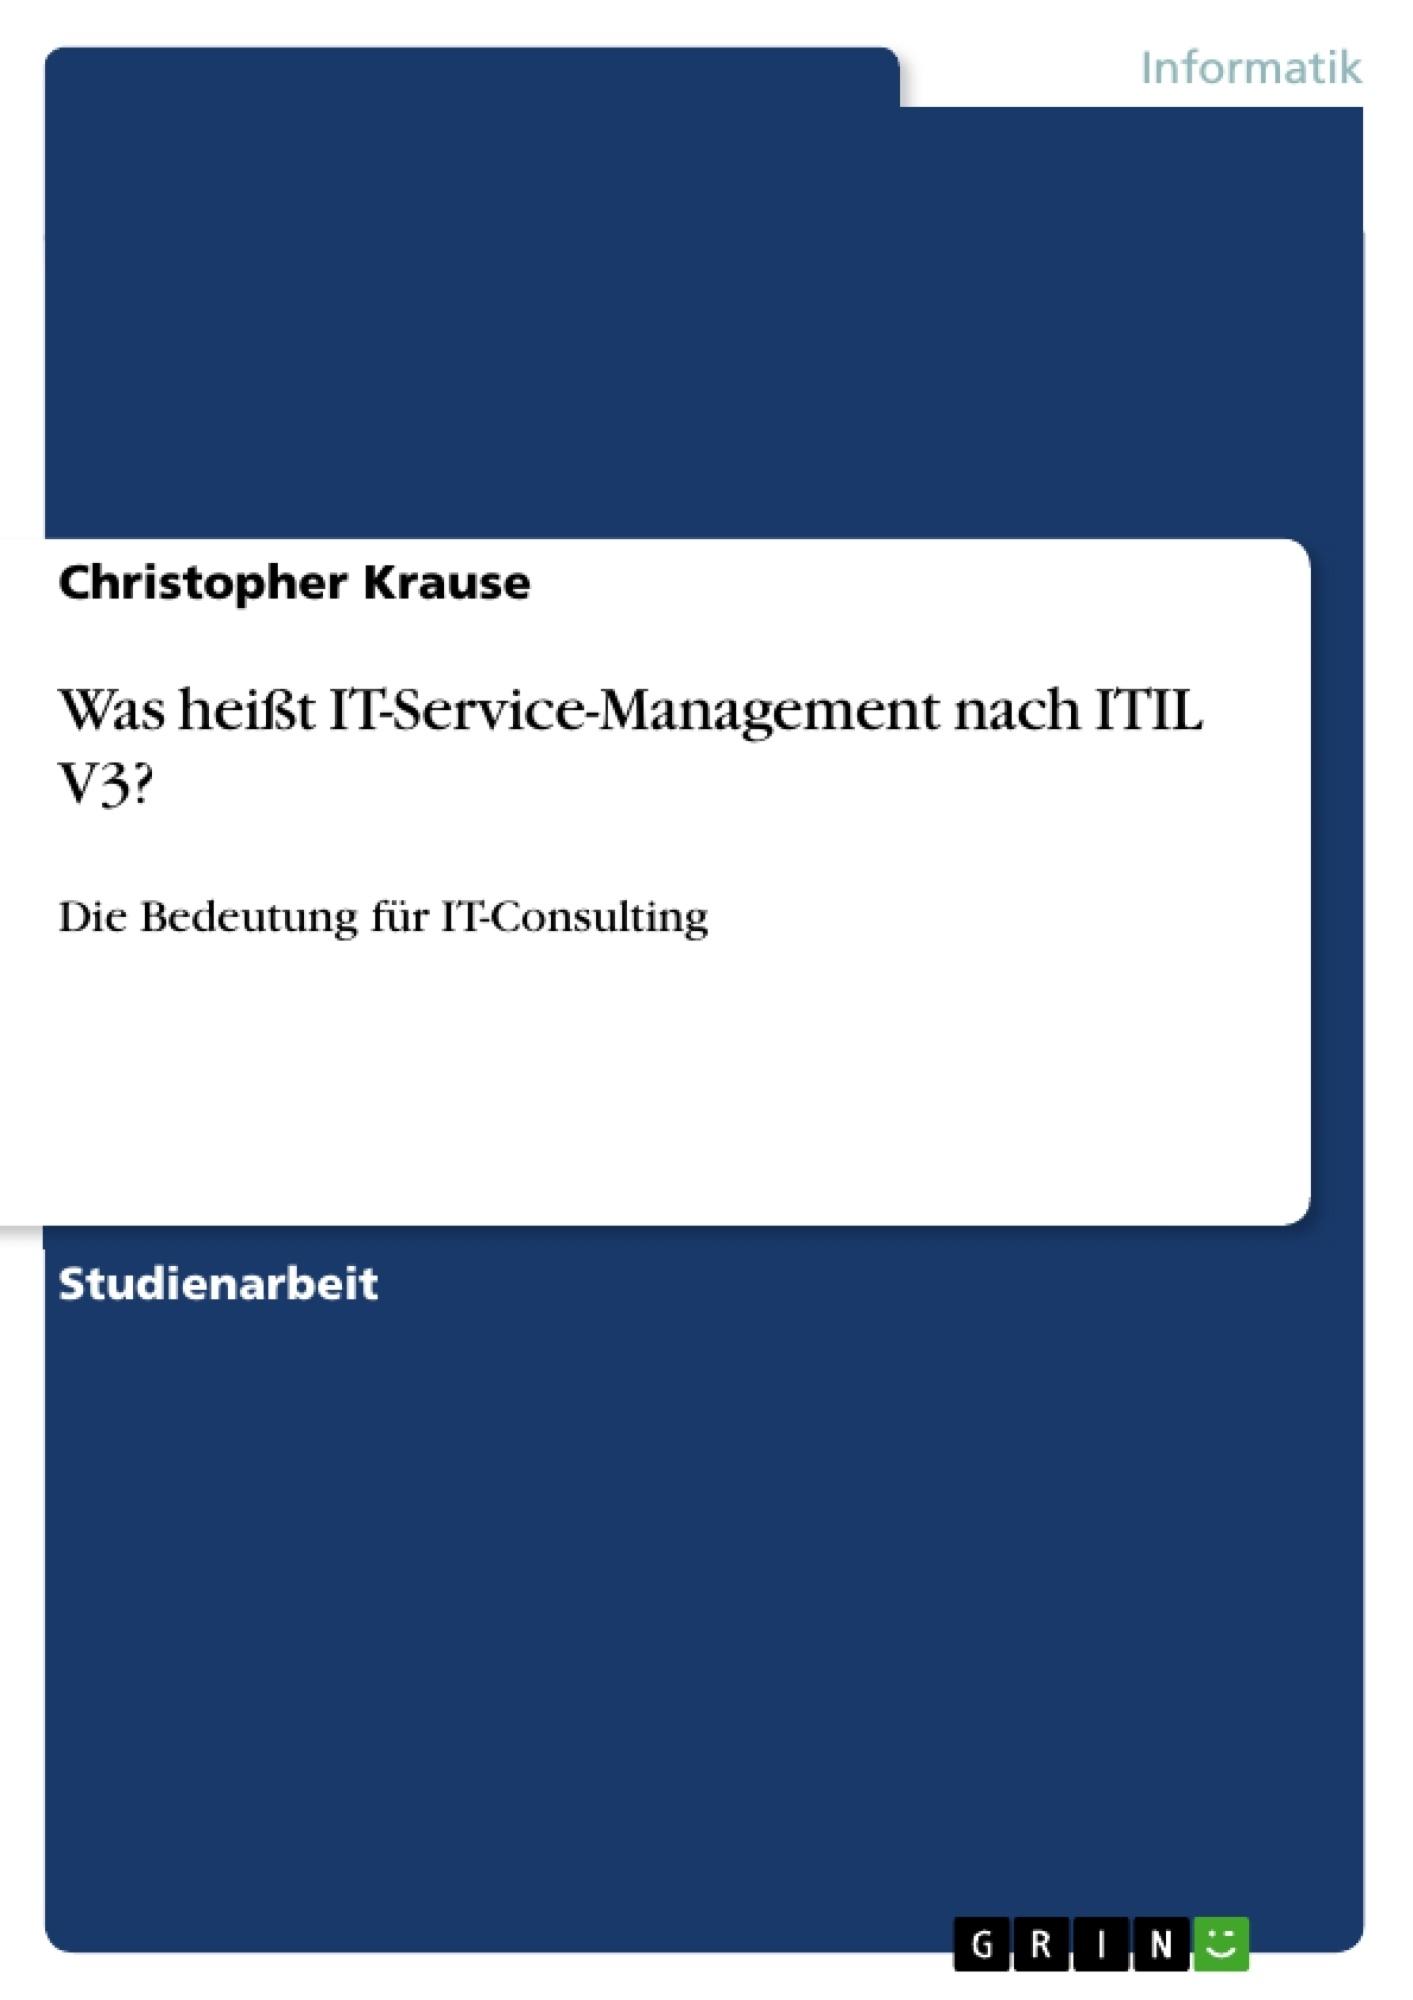 Titel: Was heißt IT-Service-Management nach ITIL V3?